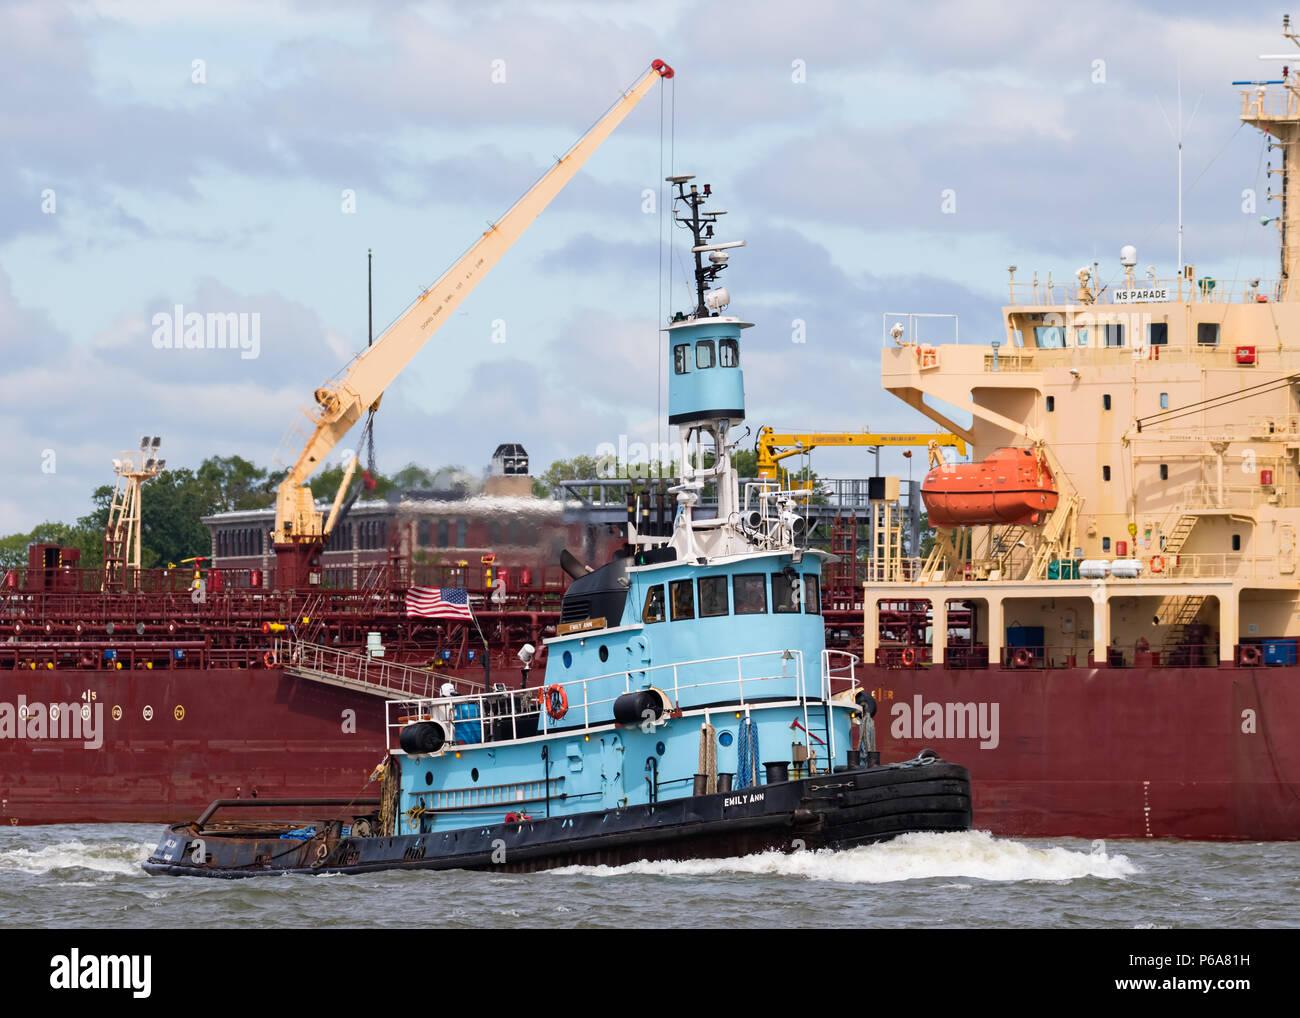 DonJon Marine Tug Boat EMILY ANN nach Osten auf den Kill Van Kull, der Tanker NS-Parade an der IMTT Bayonne vertäut. Stockfoto